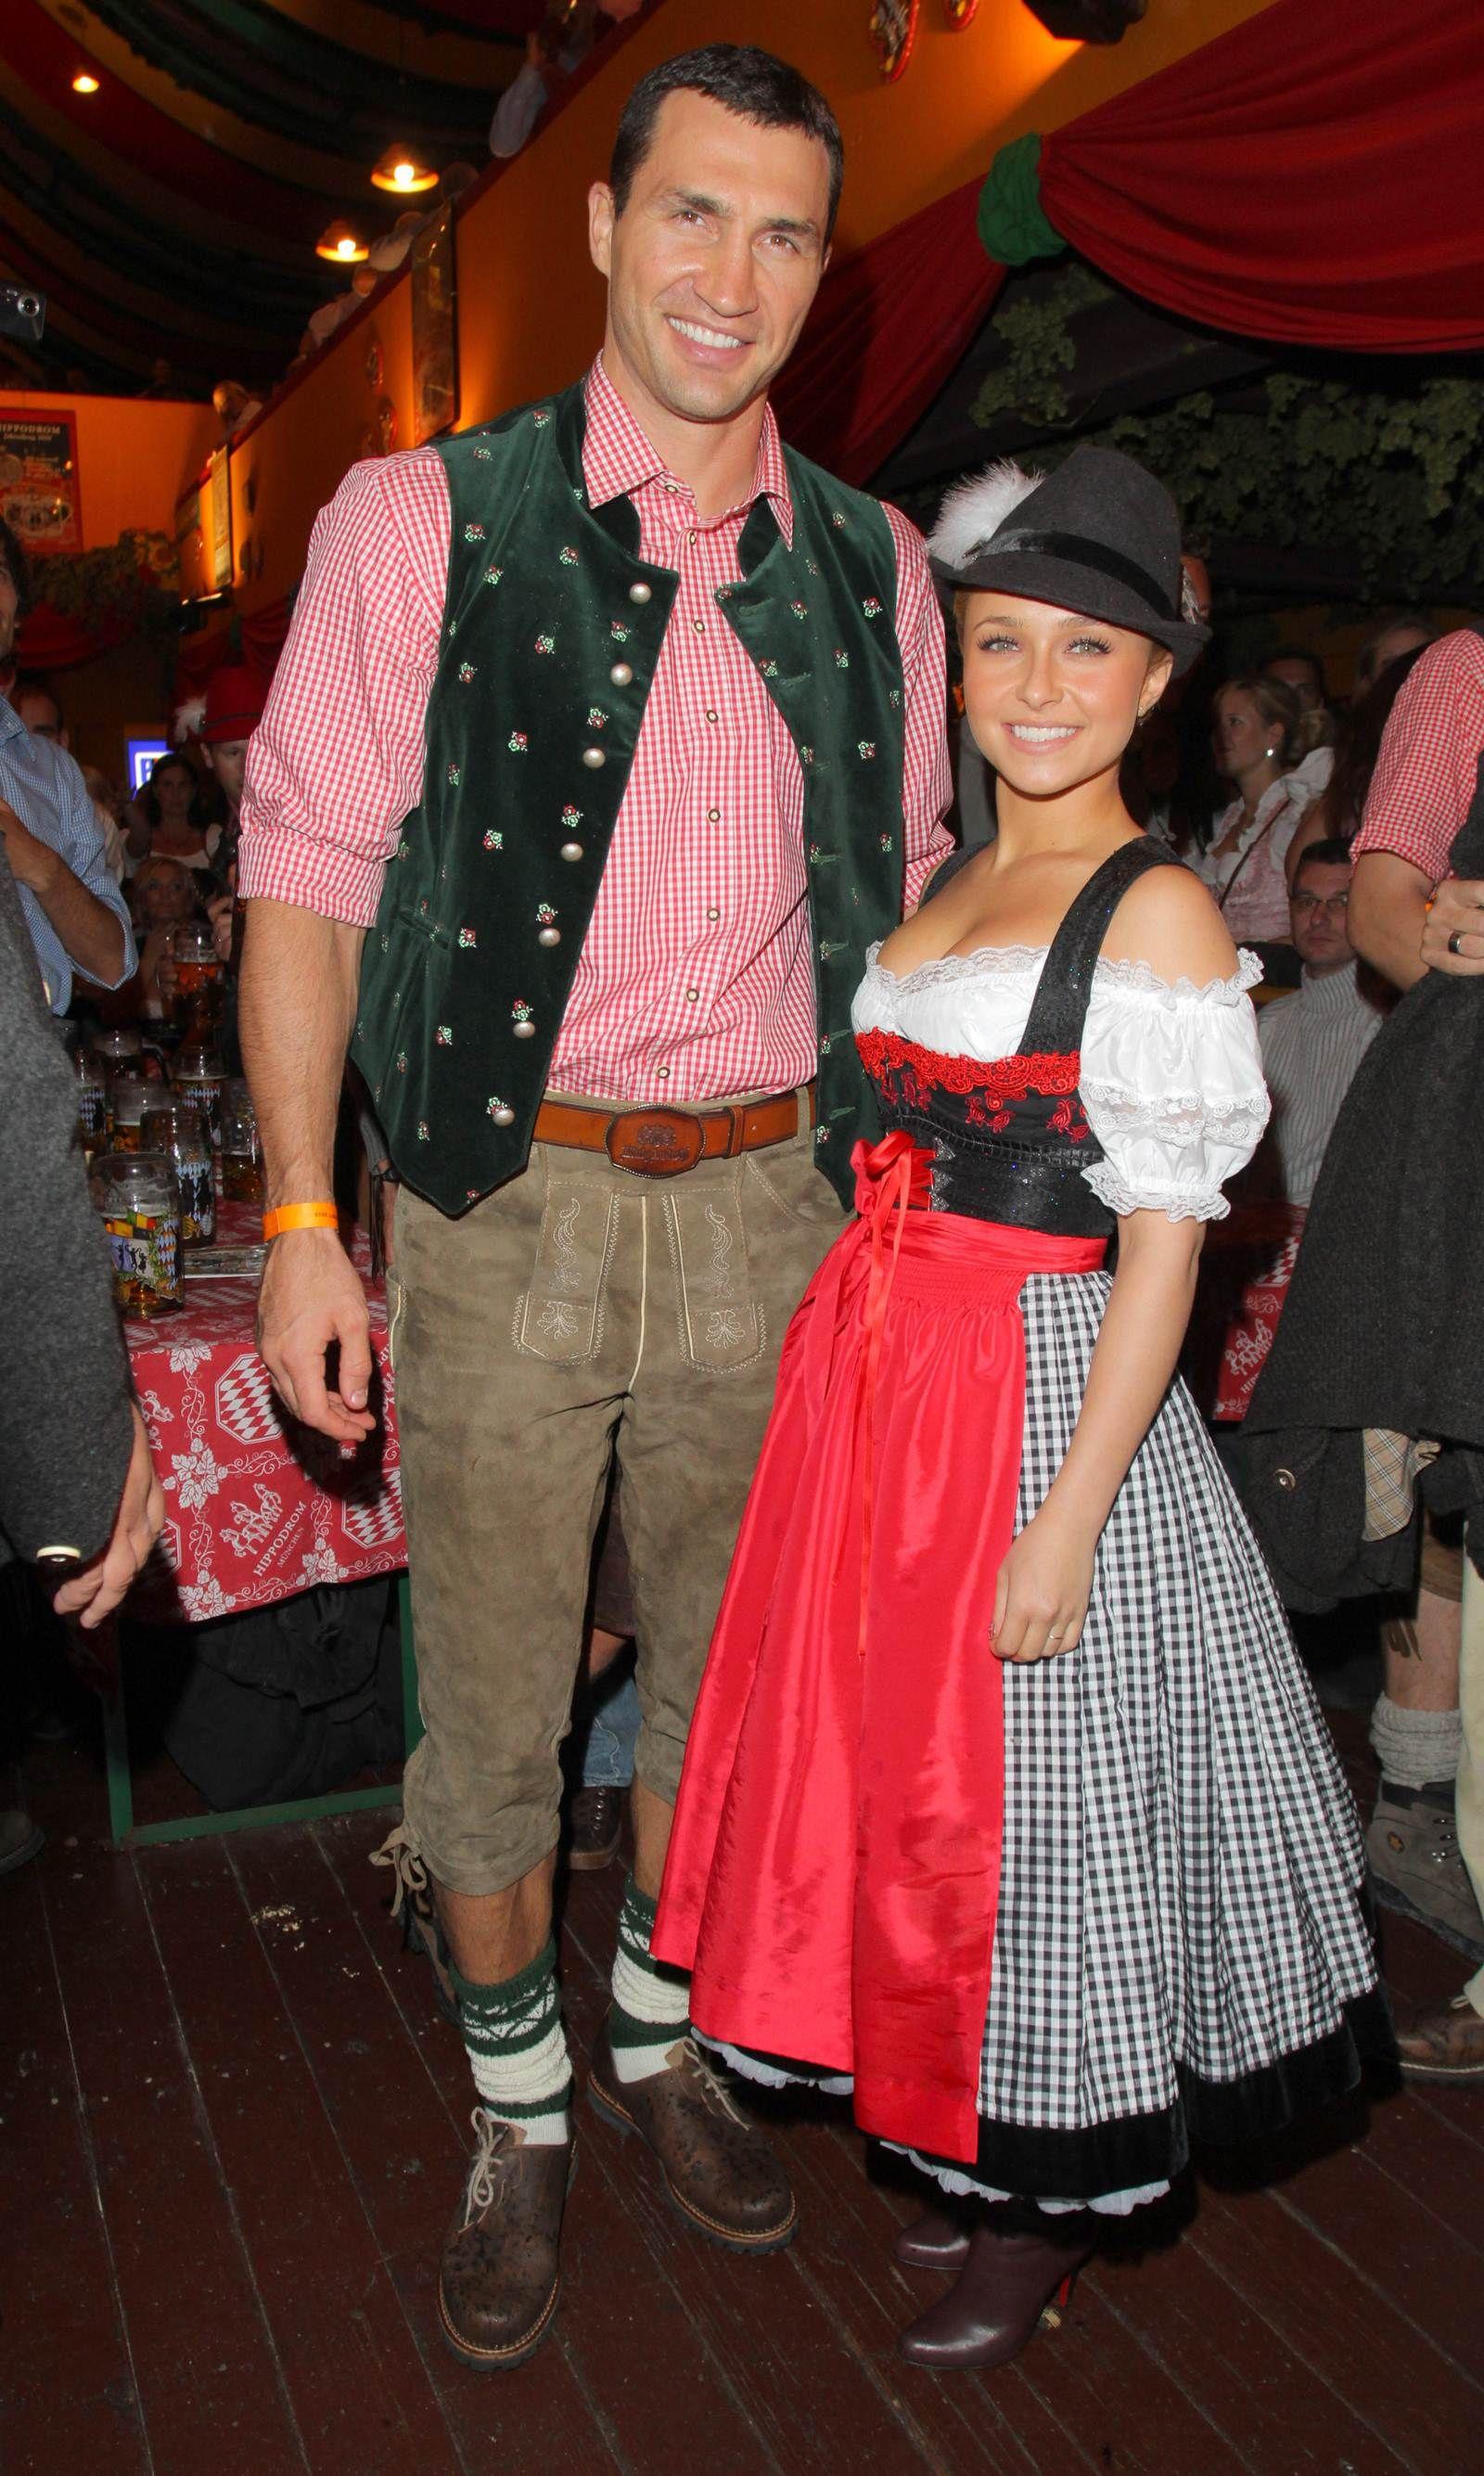 Hayden Panettiere in an Angermaier Dirndl  at Oktoberfest 2010 #TrachtenAngermaier #Angermaier